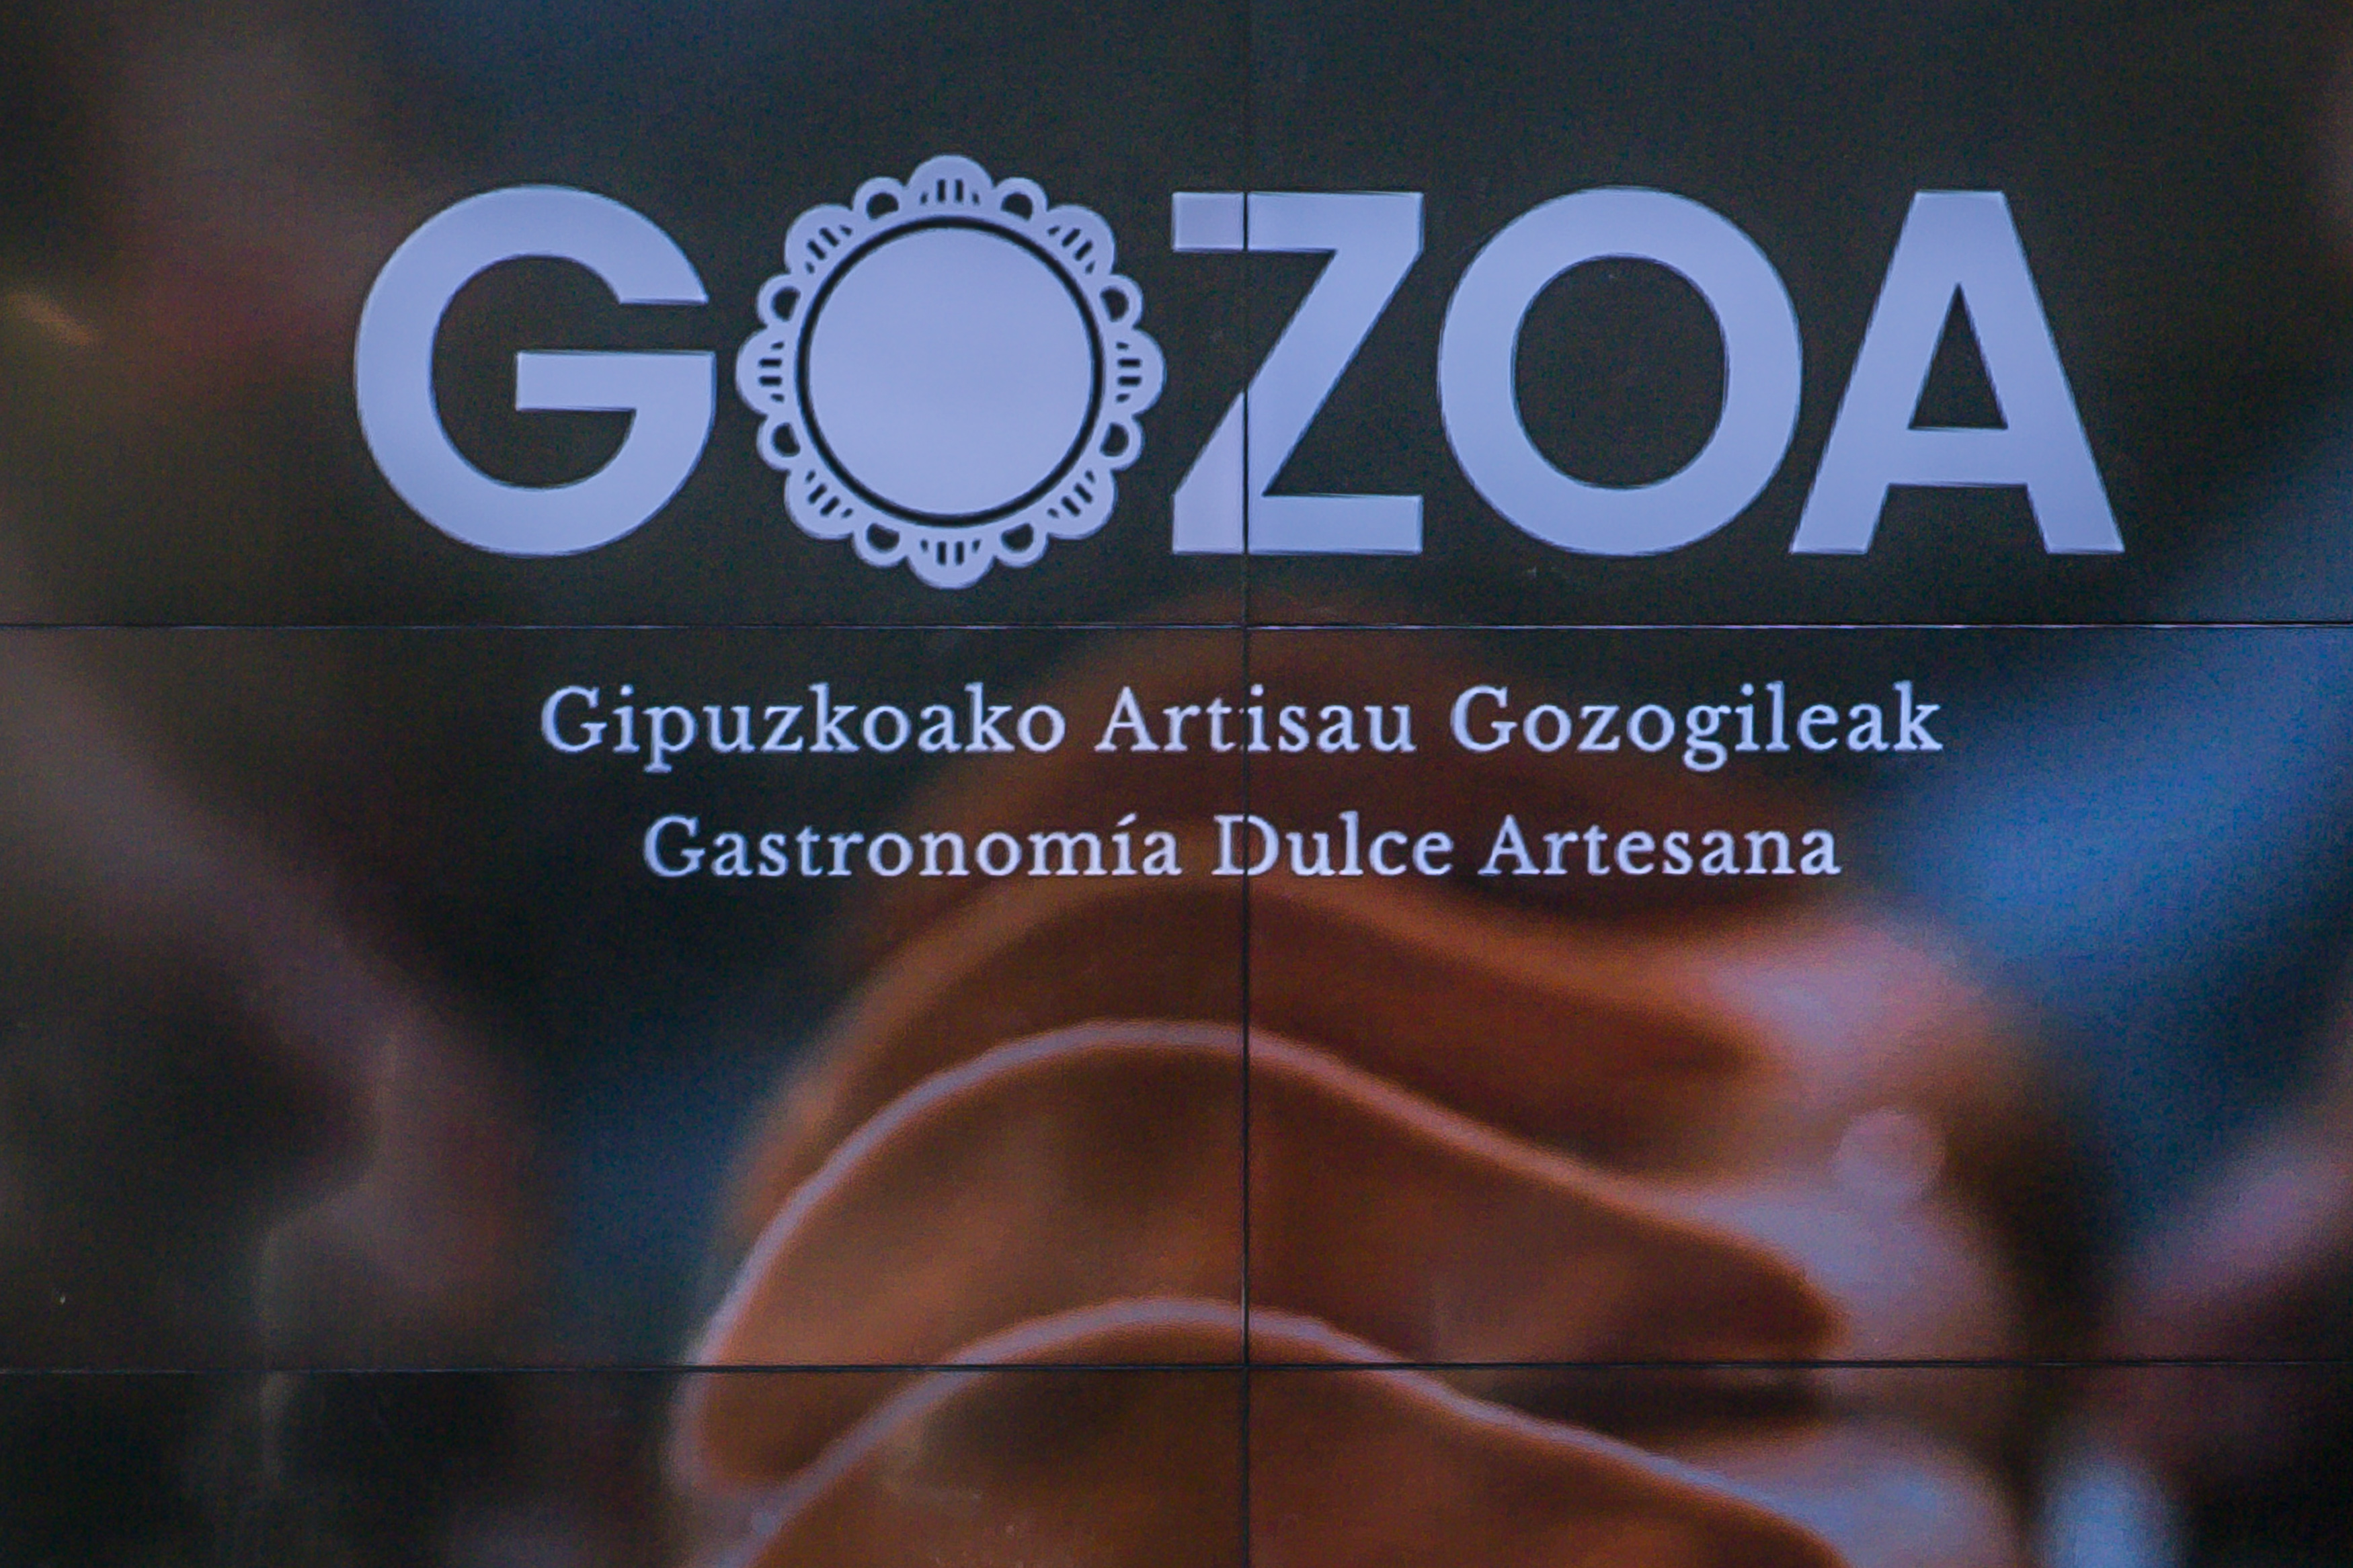 20201218-TAPIA-GOZOA-148.jpg